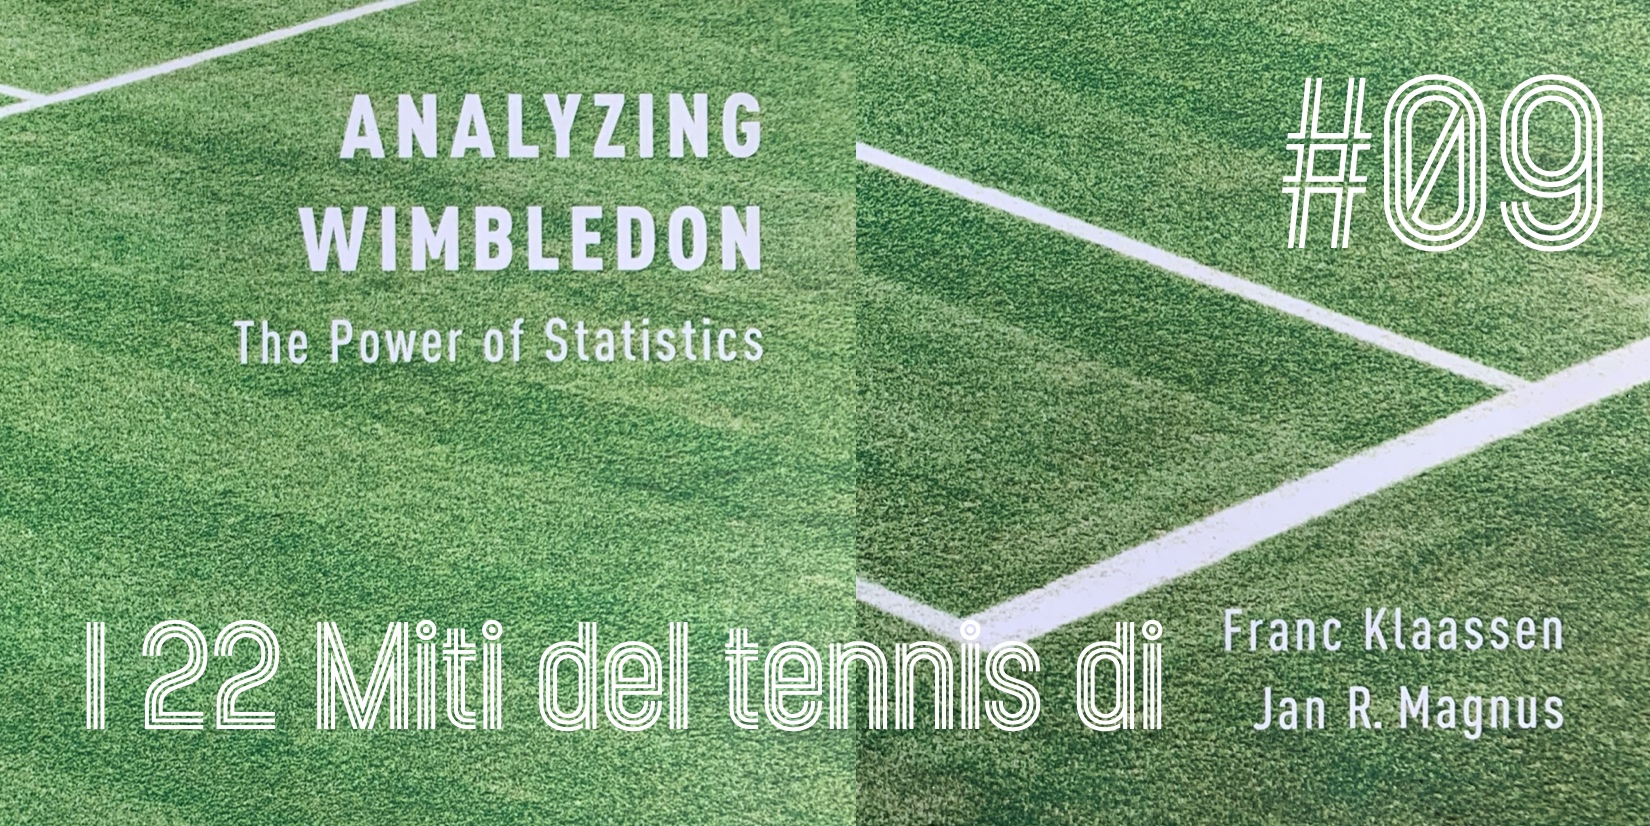 I 22 miti del tennis di Klaassen & Magnus – Mito 9 - settesei.it